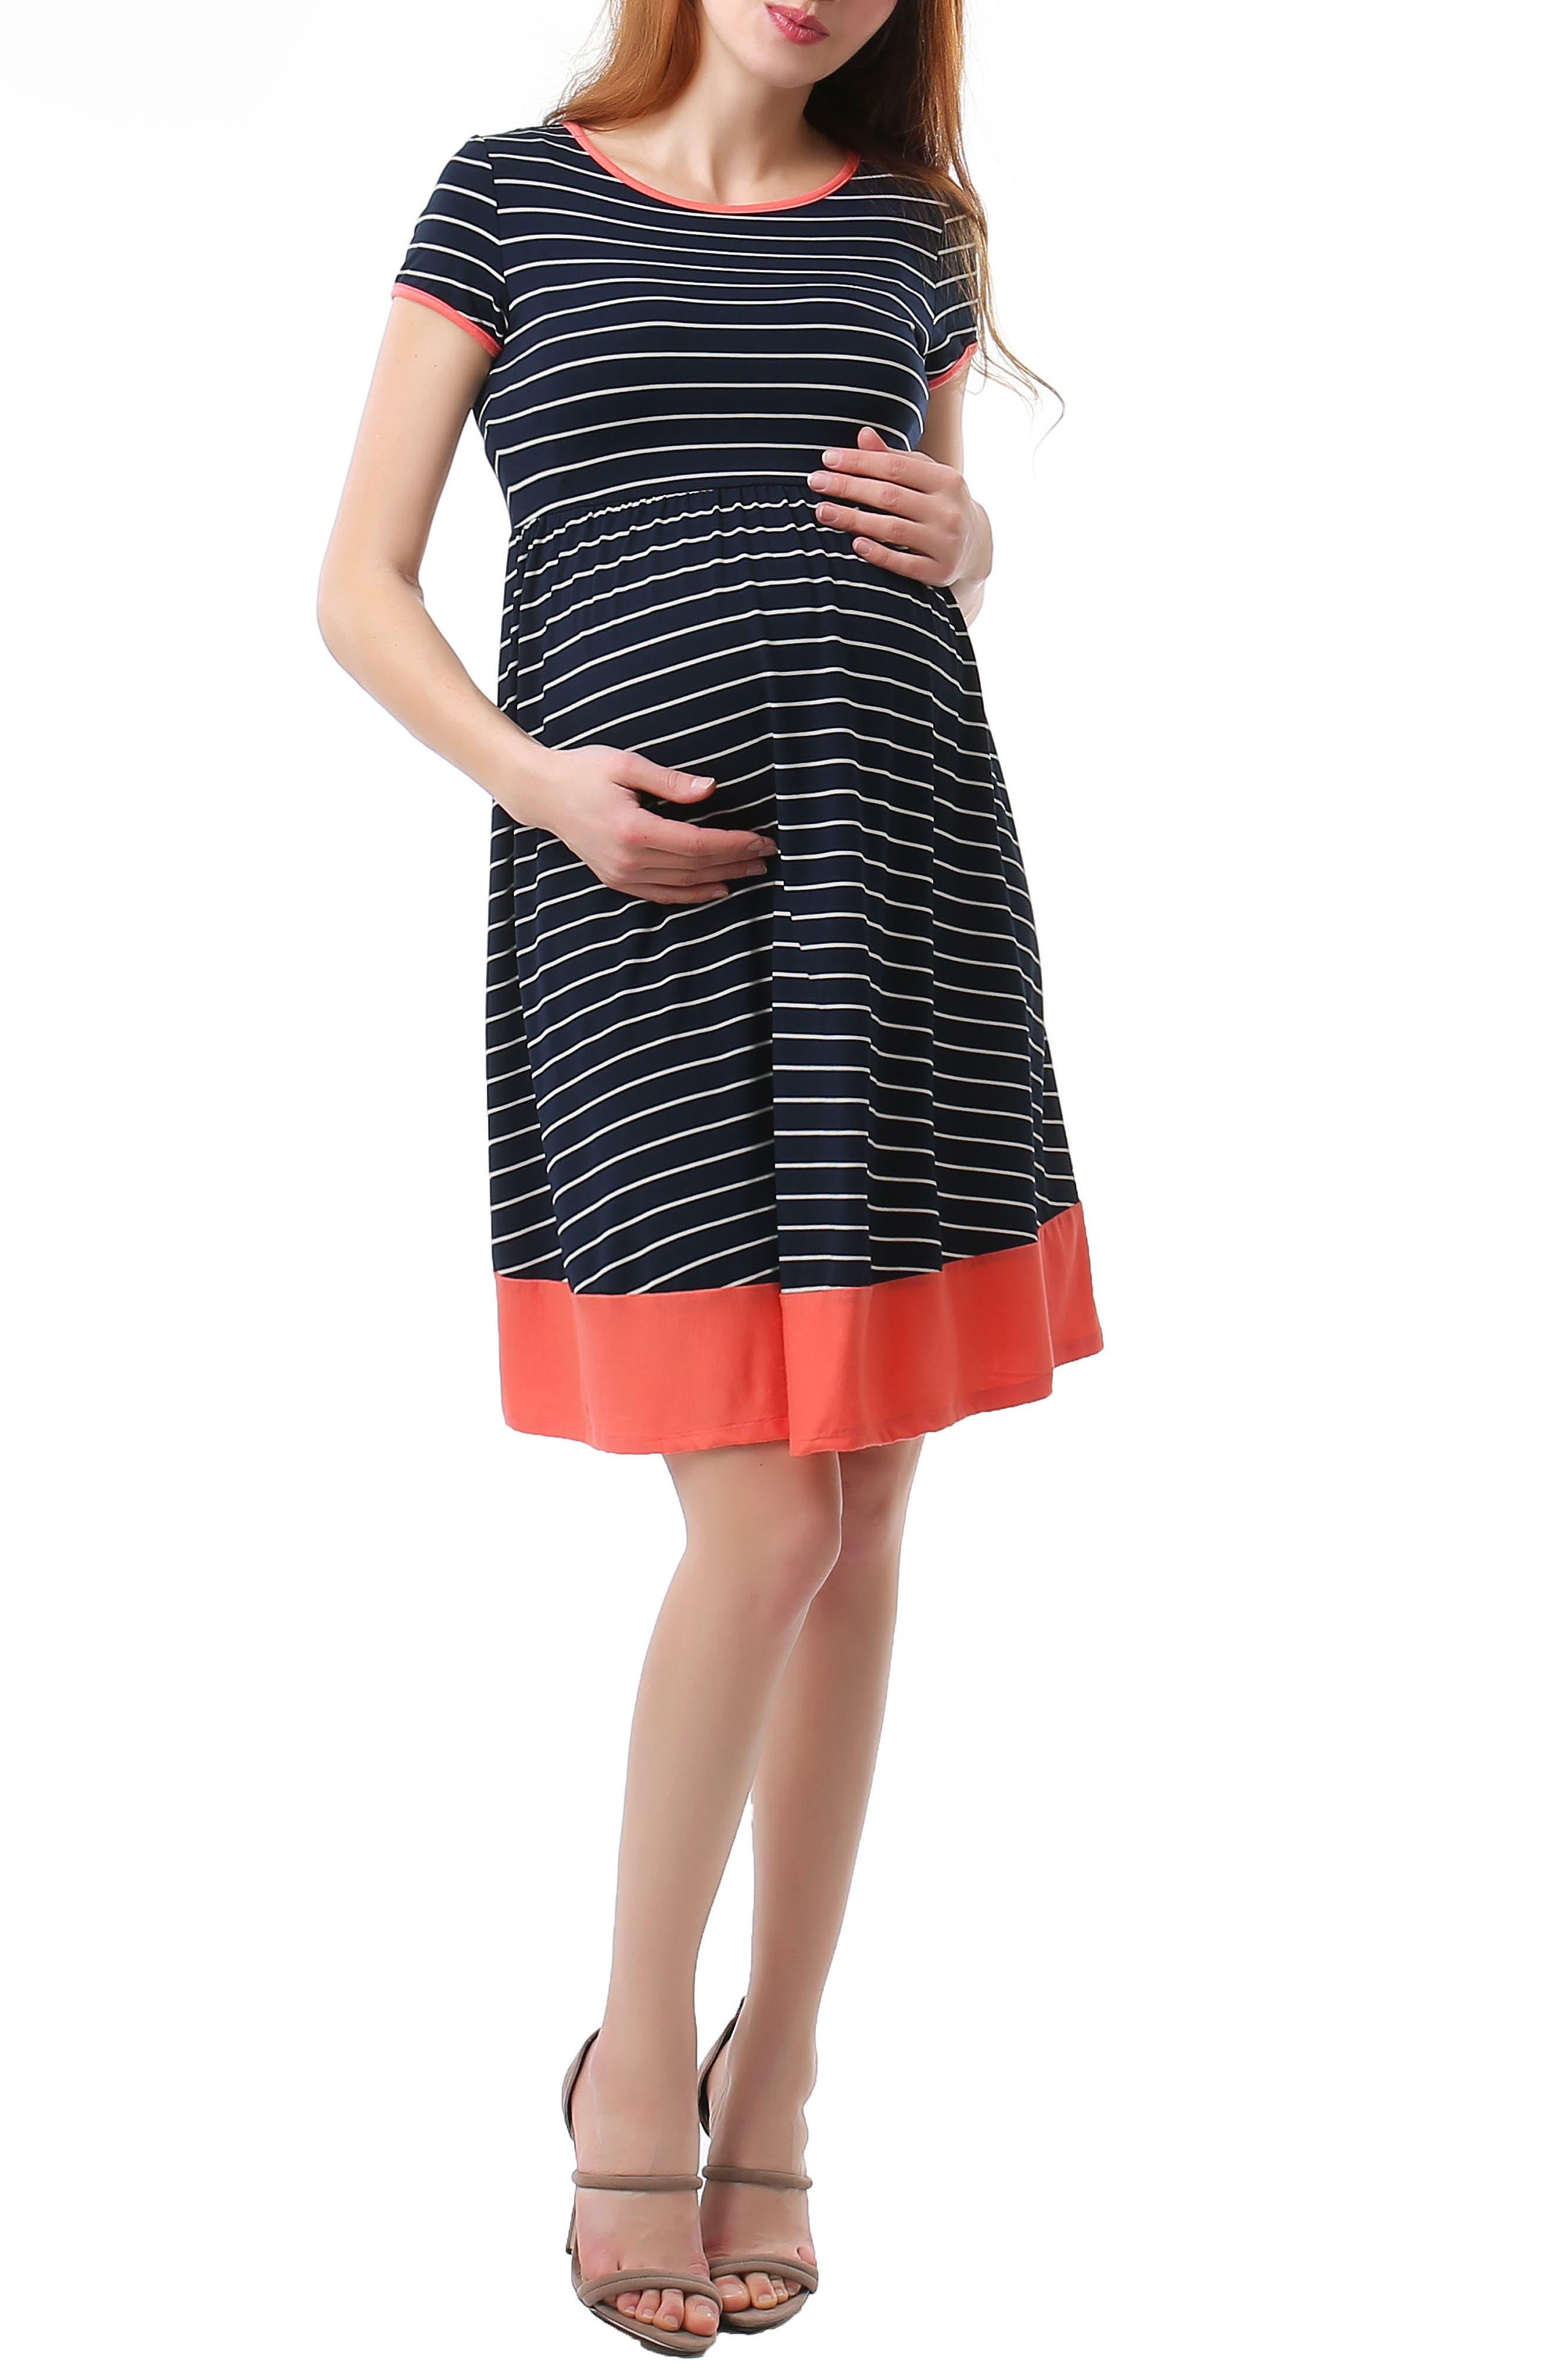 Kira Stripe Maternity Skater Dress,                         Main,                         color,